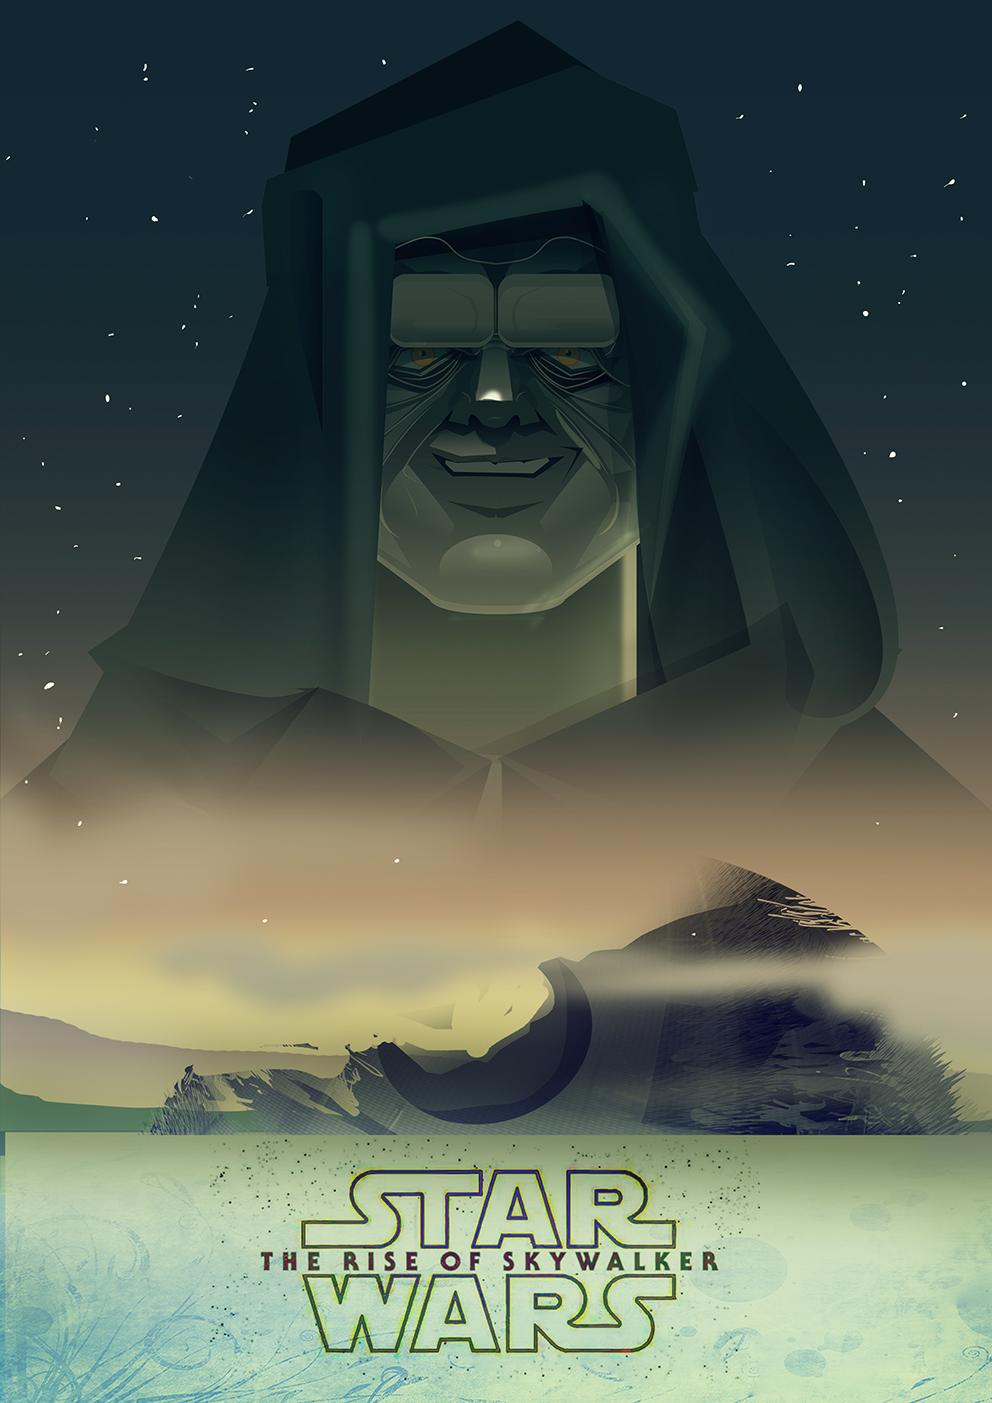 Star Wars The Rise Of Skywalker art by Cristhian Hova